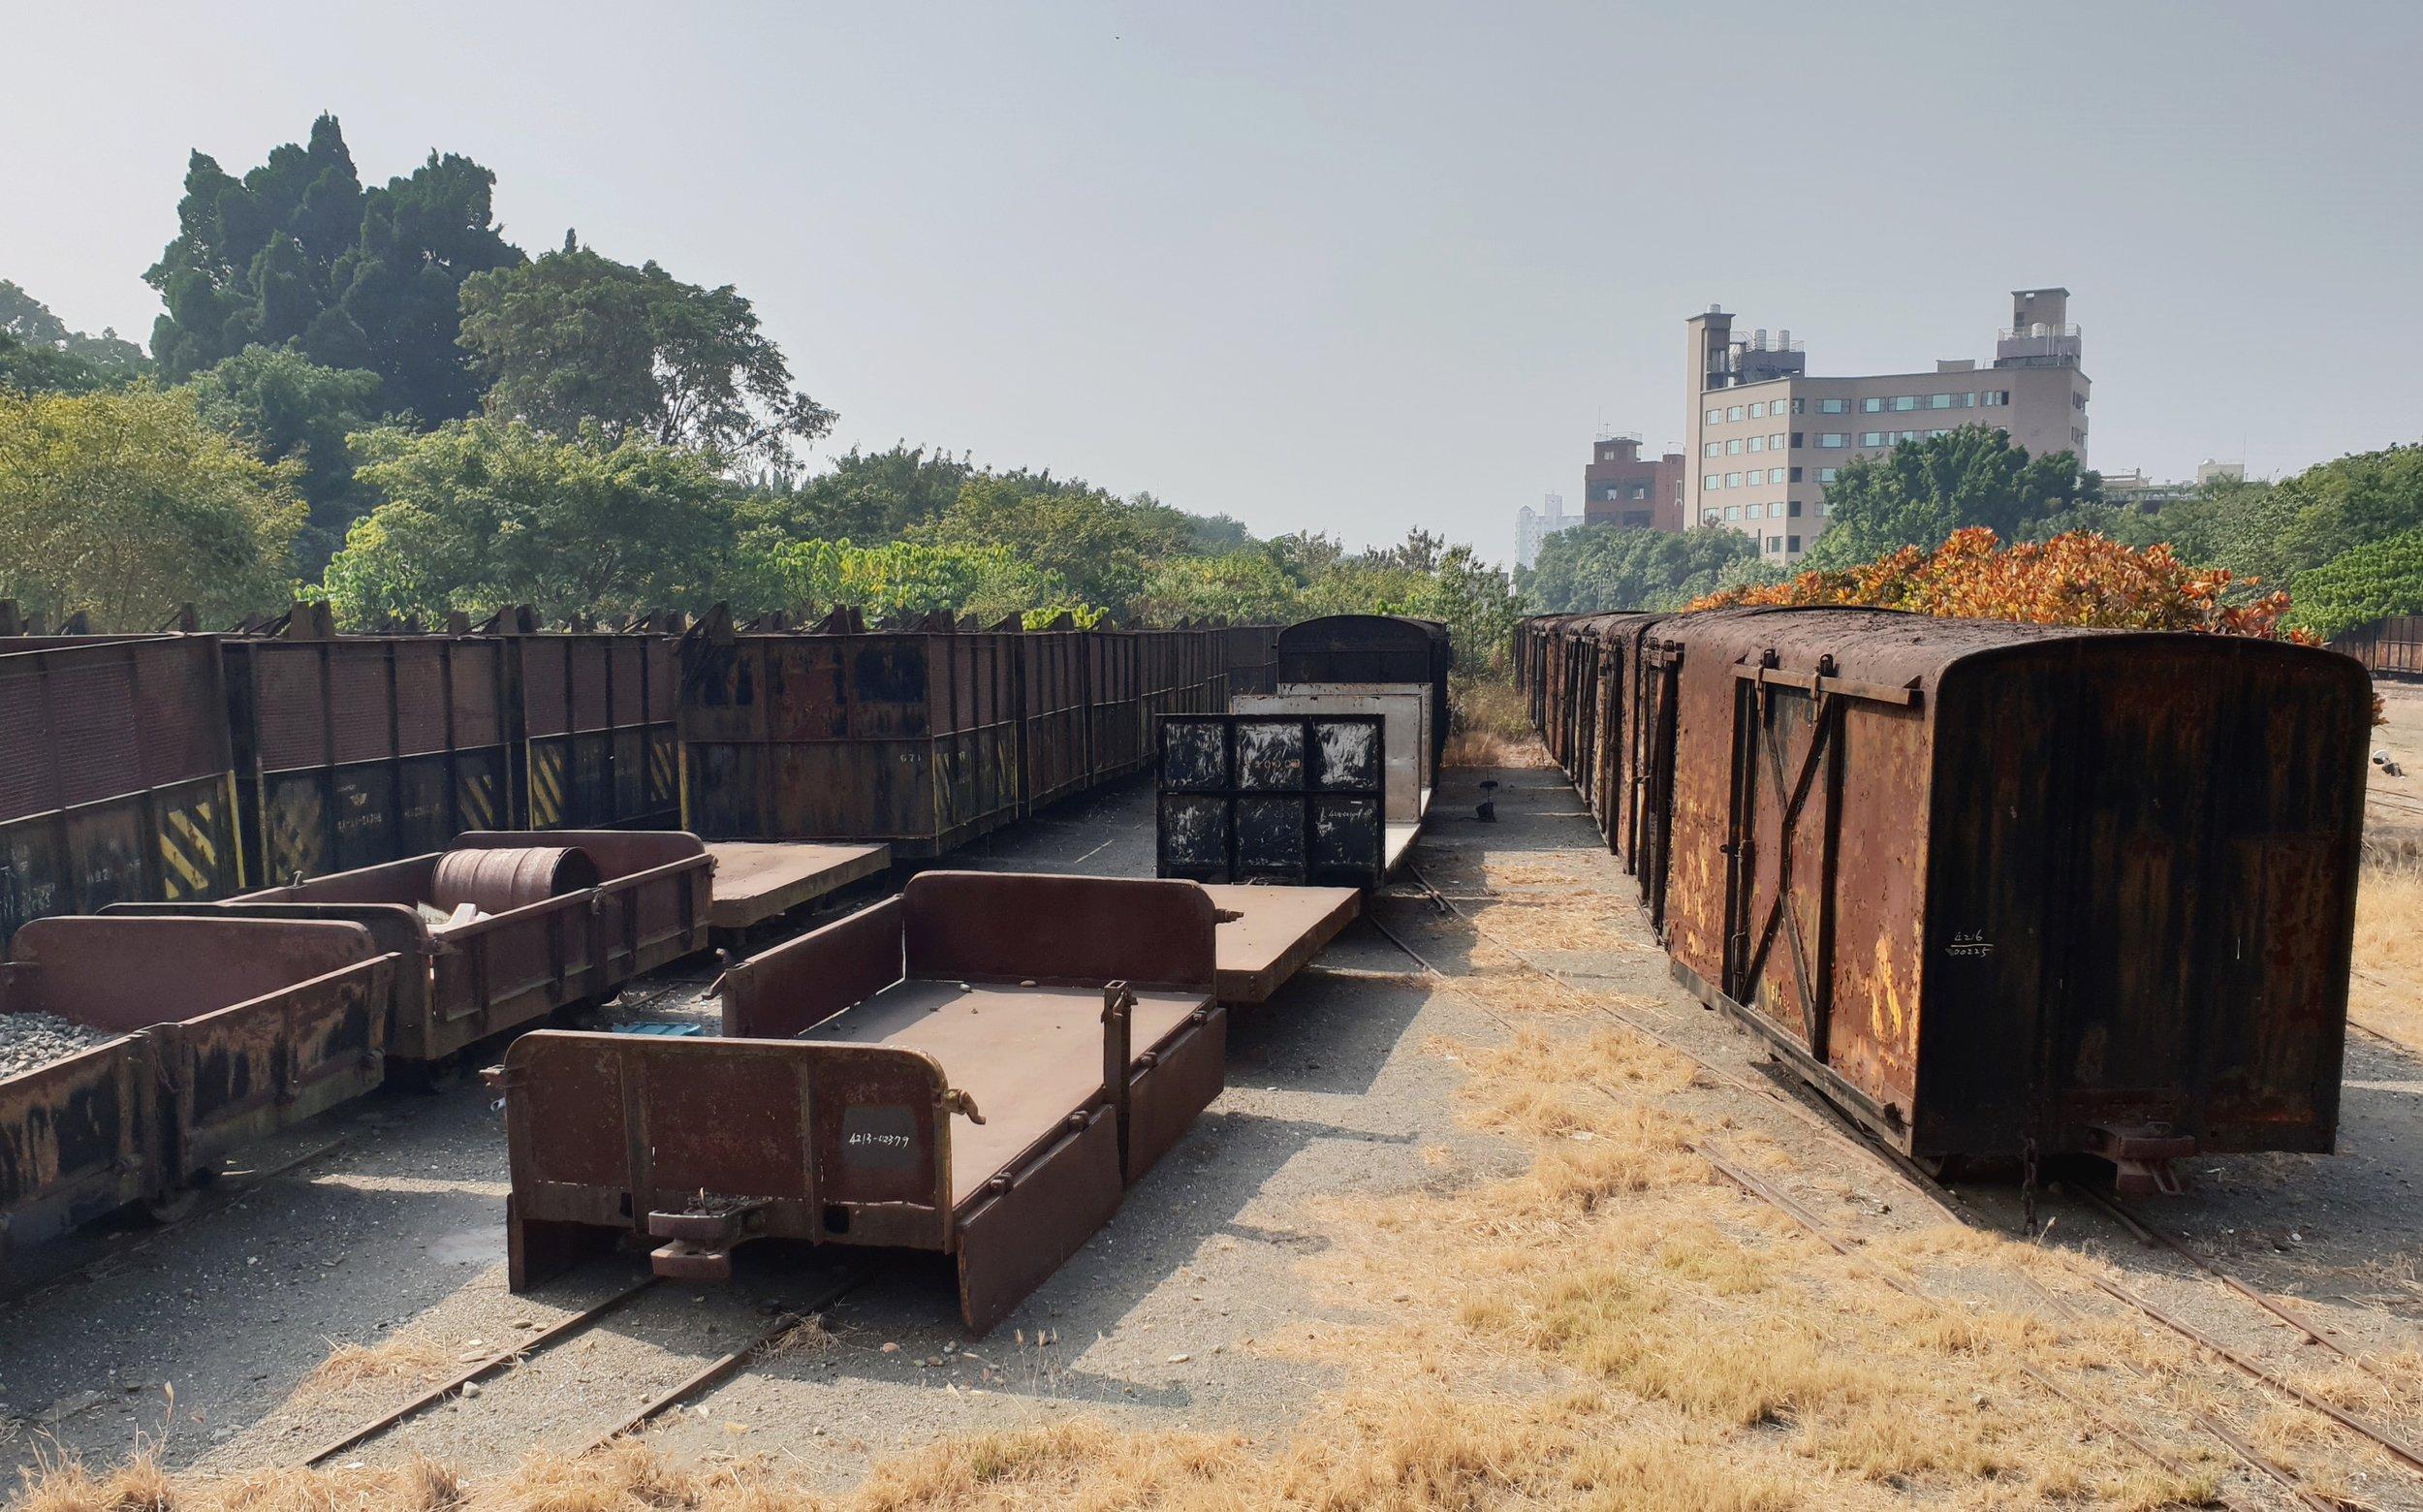 Abandoned railcarts